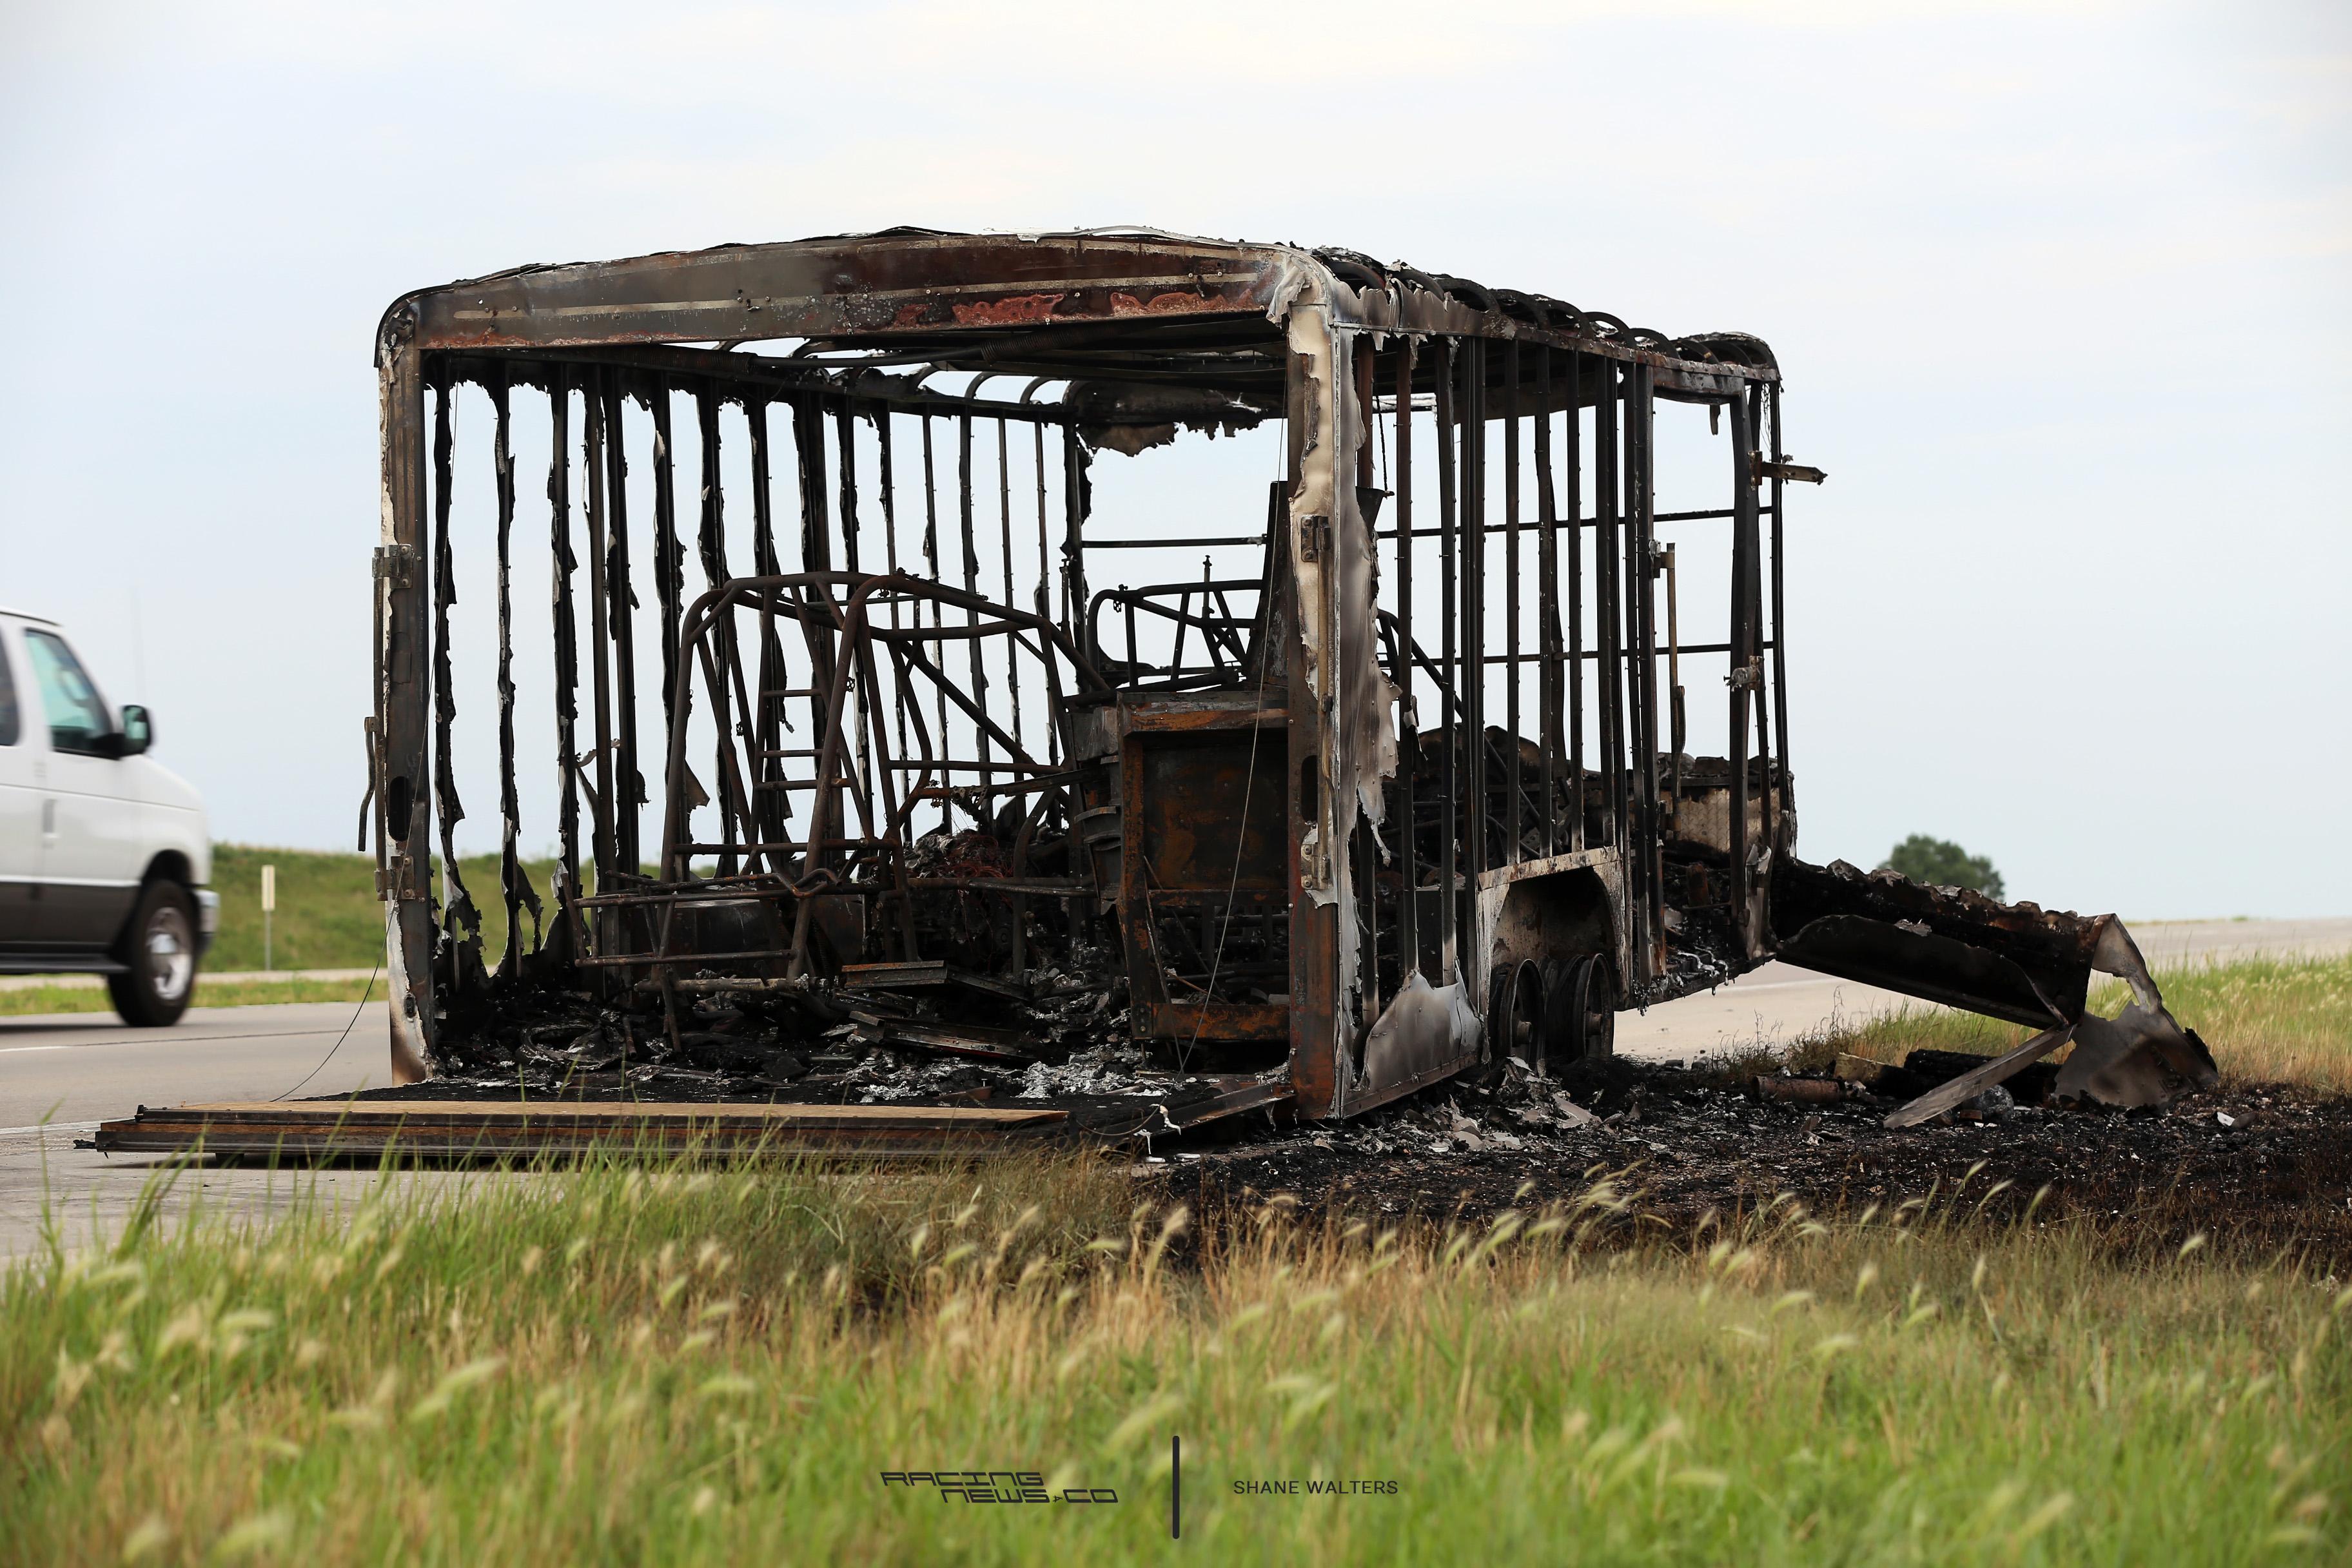 Abandoned Racing Hauler Fire 0551